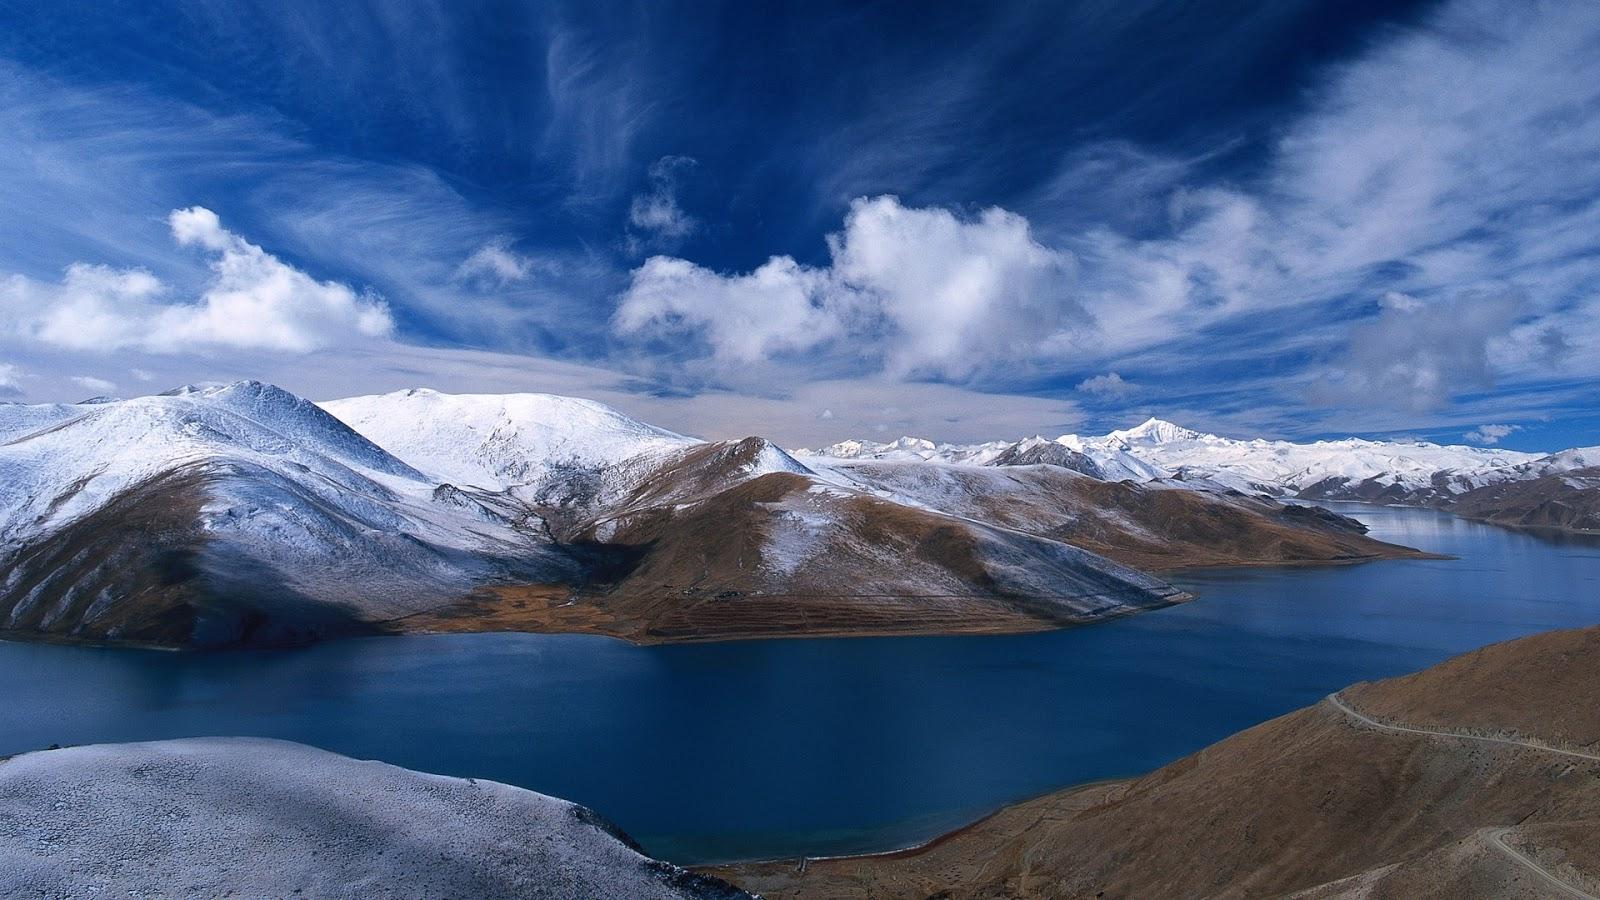 Potentes Montañas Nevadas Fondos De Pantalla: Imagenes Hilandy: Fondo Pantalla Paisajes HD Montañas Nevadas